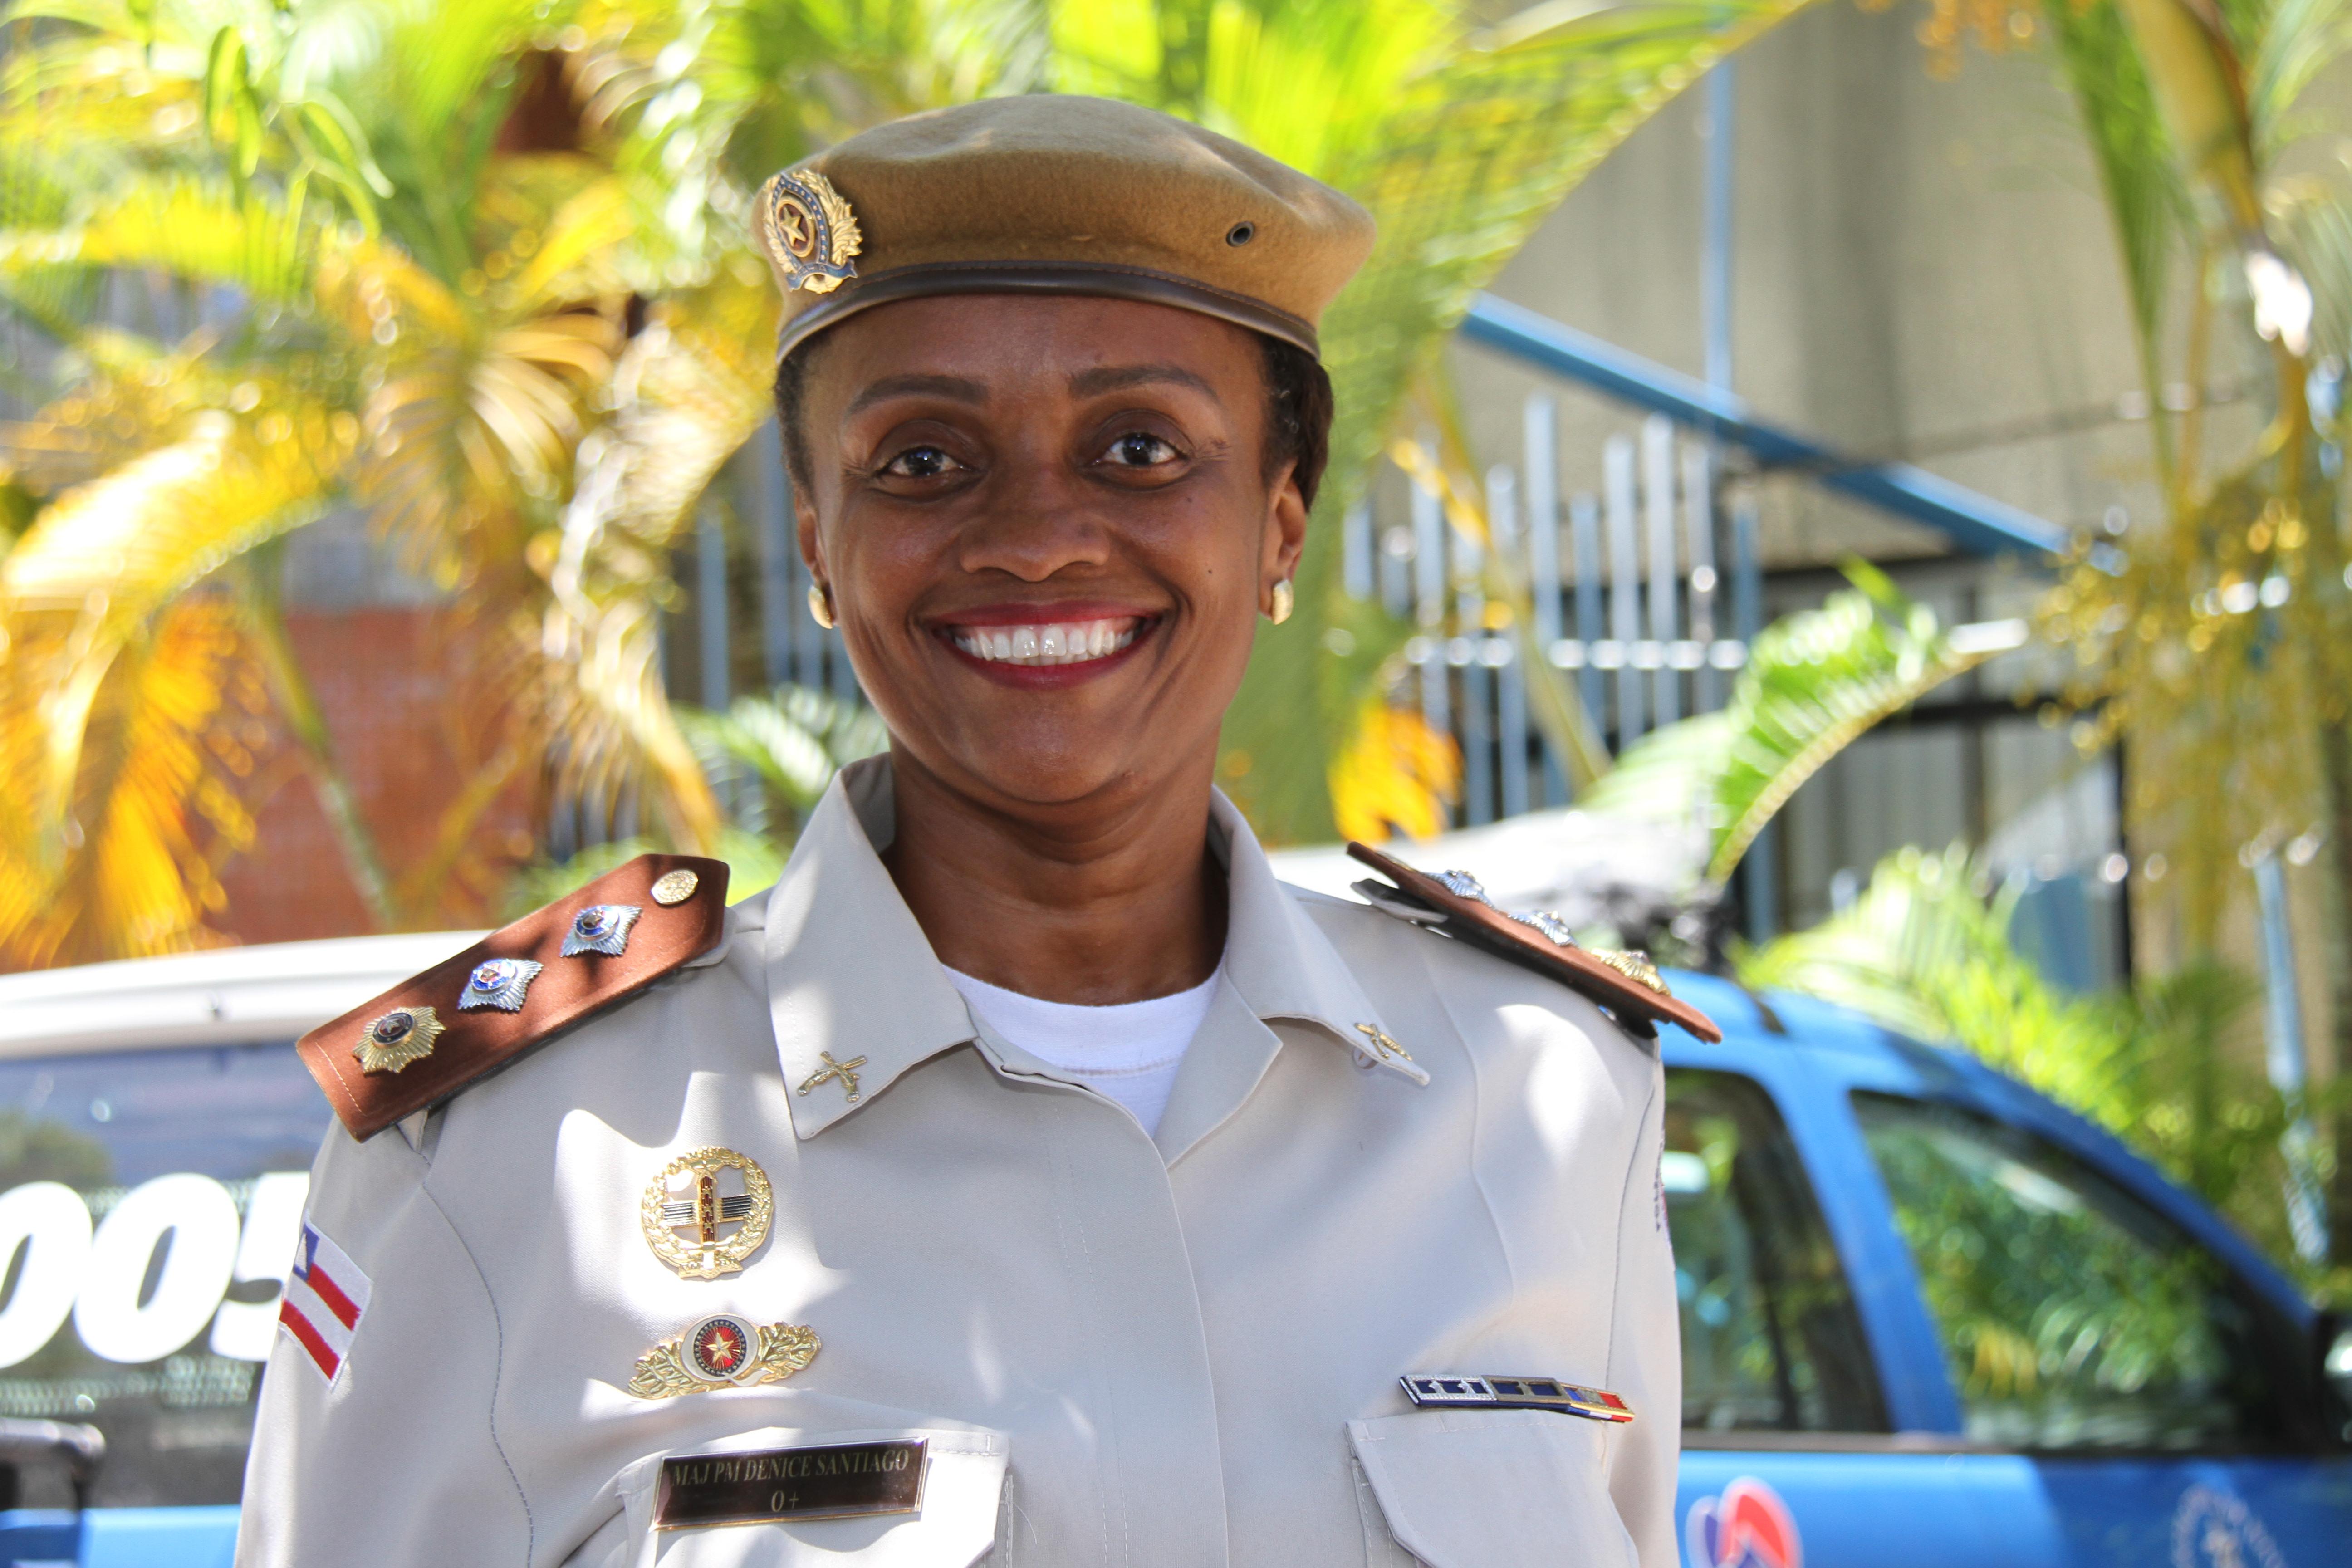 Major Denice Santiago, idealizadora e comandante da Ronda Maria da Penha na Polícia Militar da Bahia